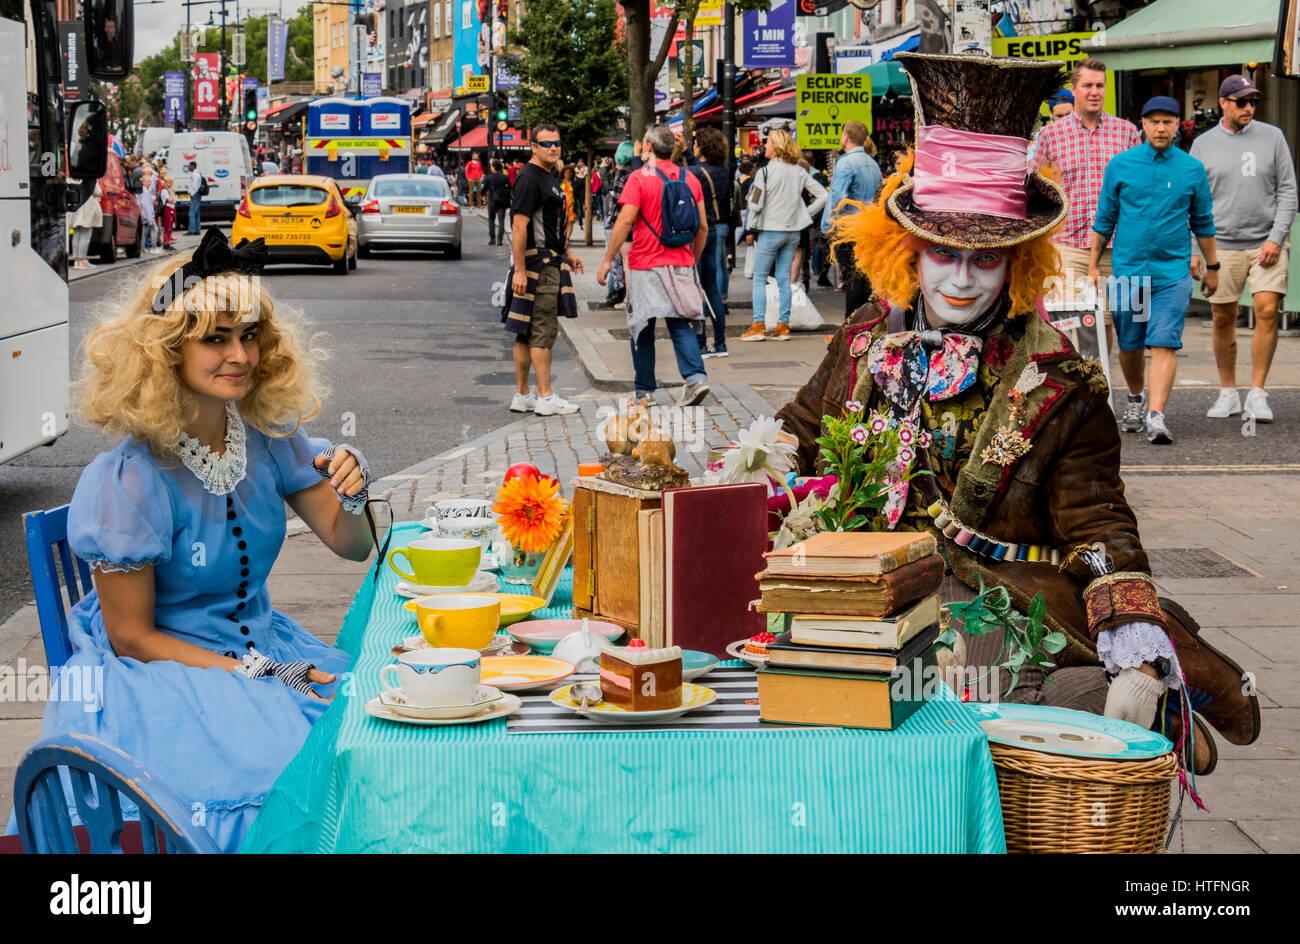 Alice in wonderland reenactment of mad hatters tea party Camden London England - Stock Image